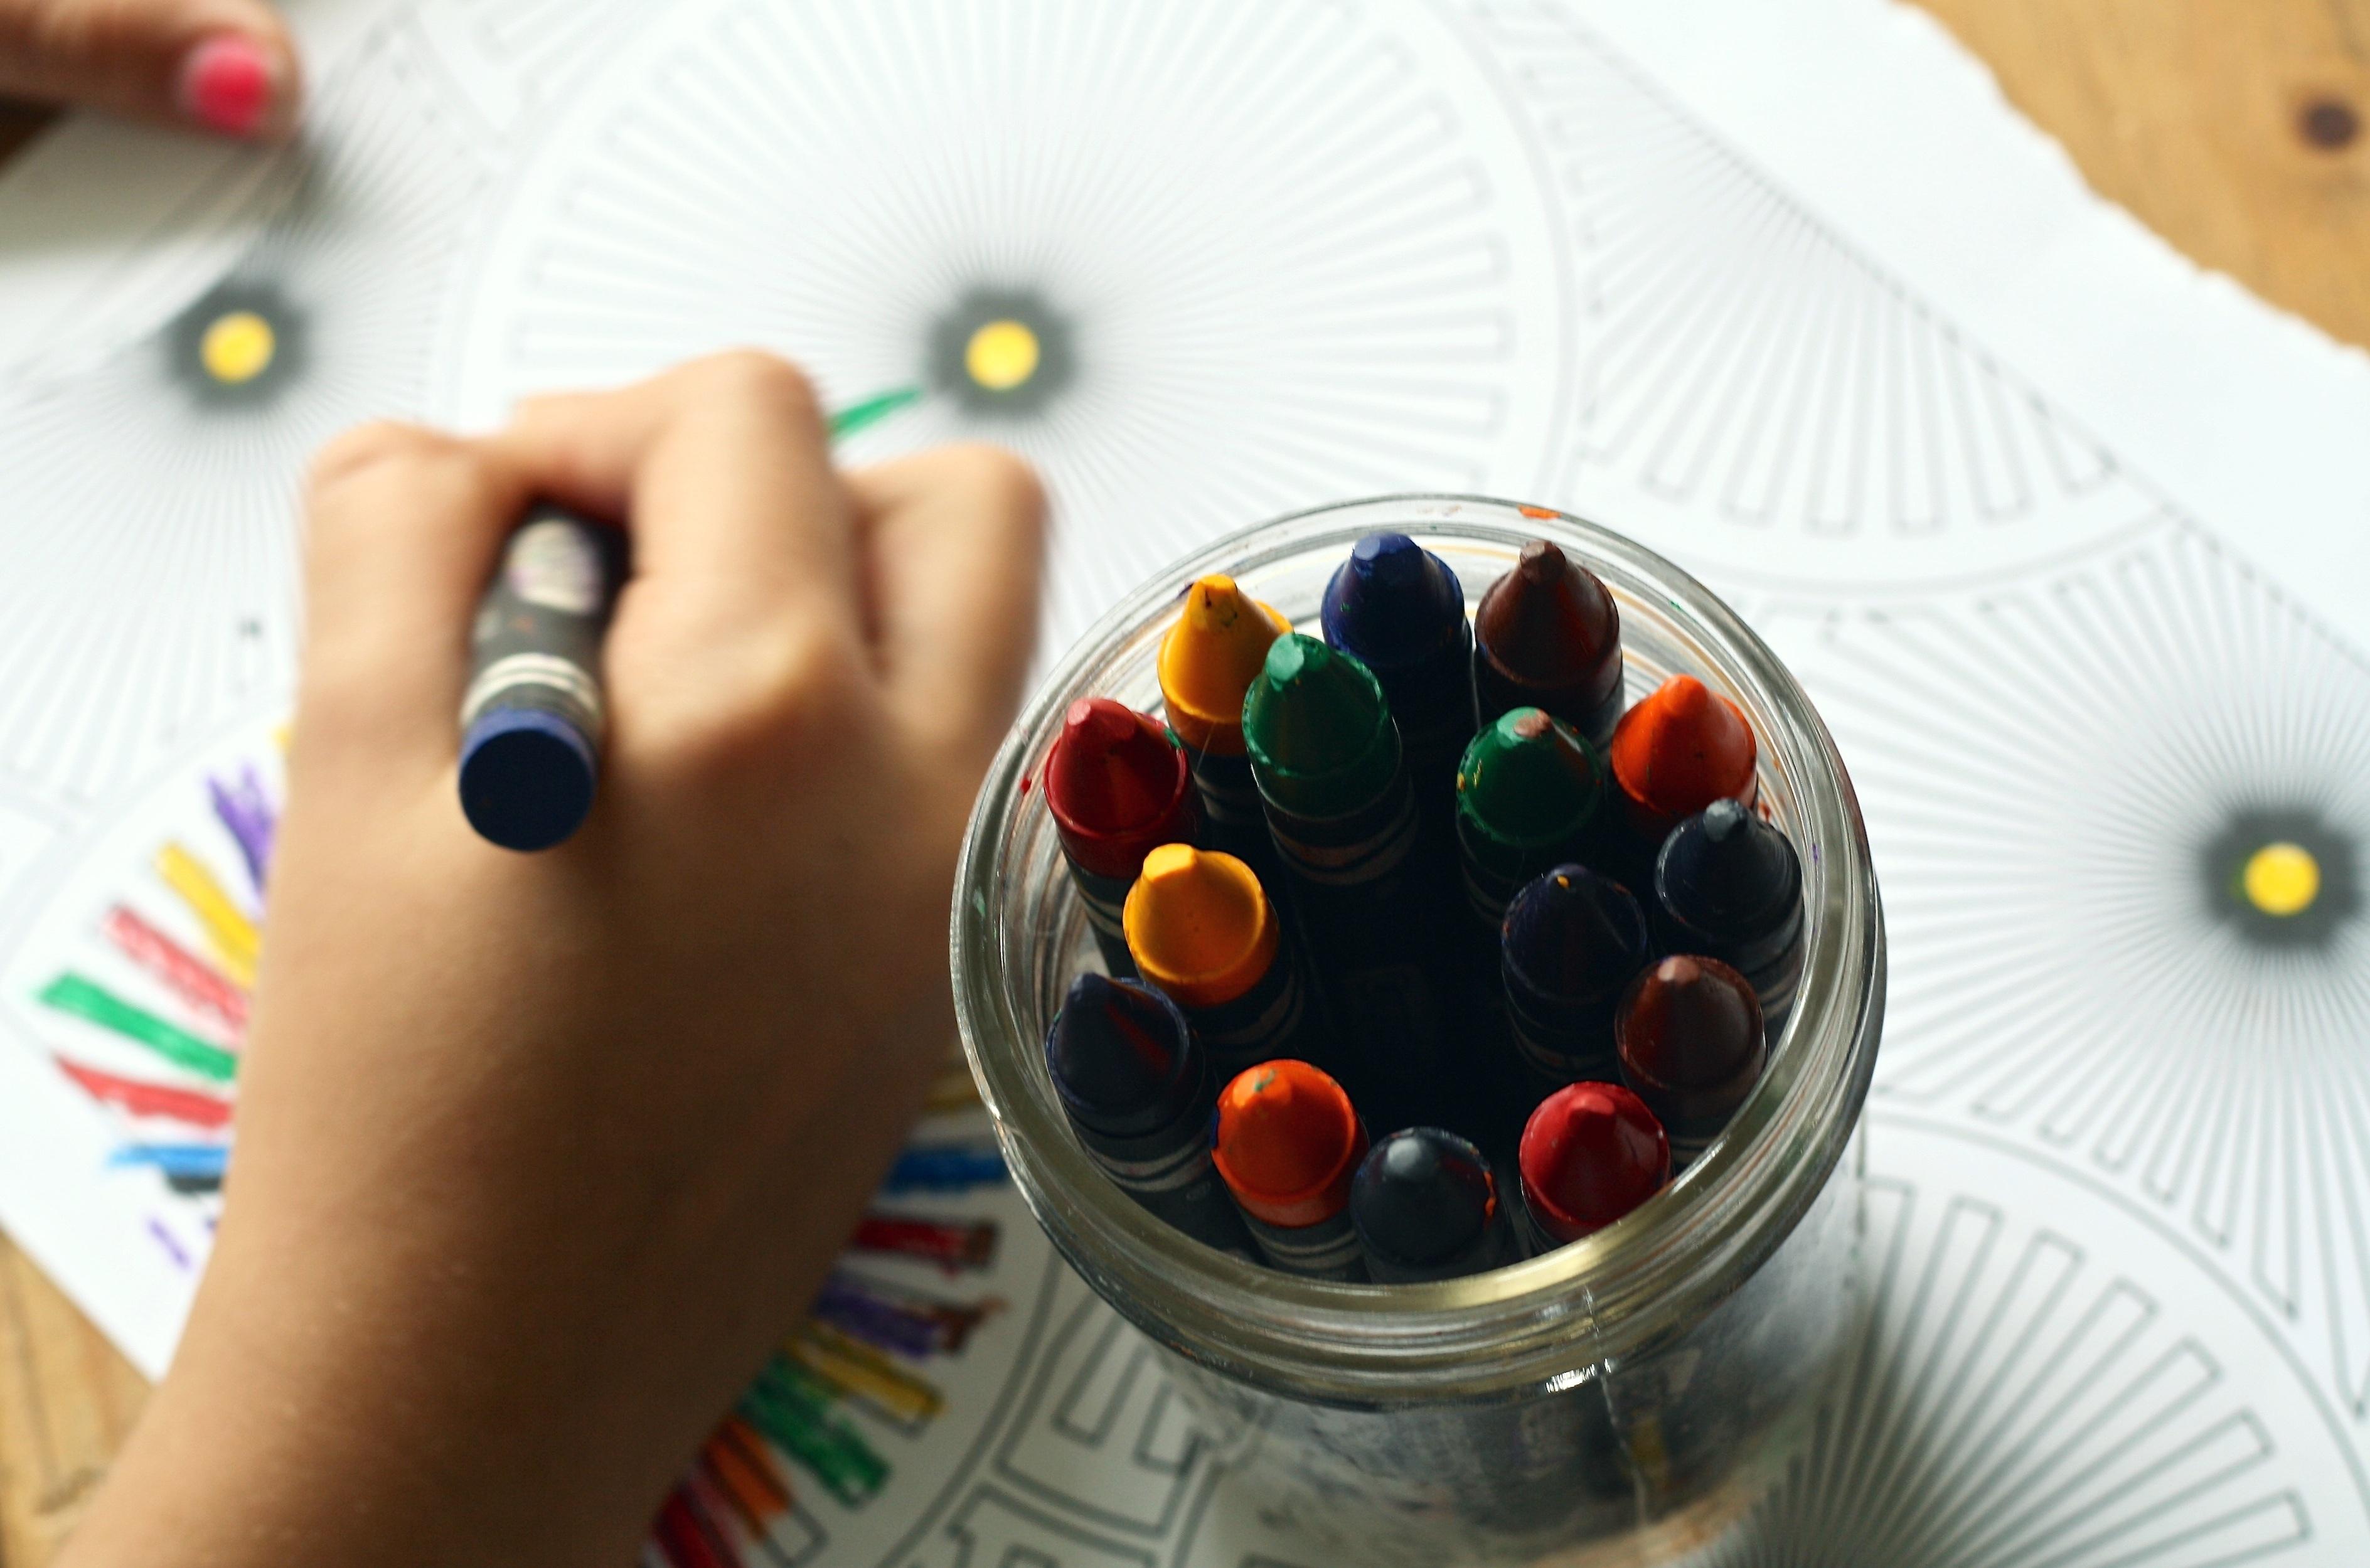 crayons-coloring-book-coloring-book-159579.jpeg (3777×2499)